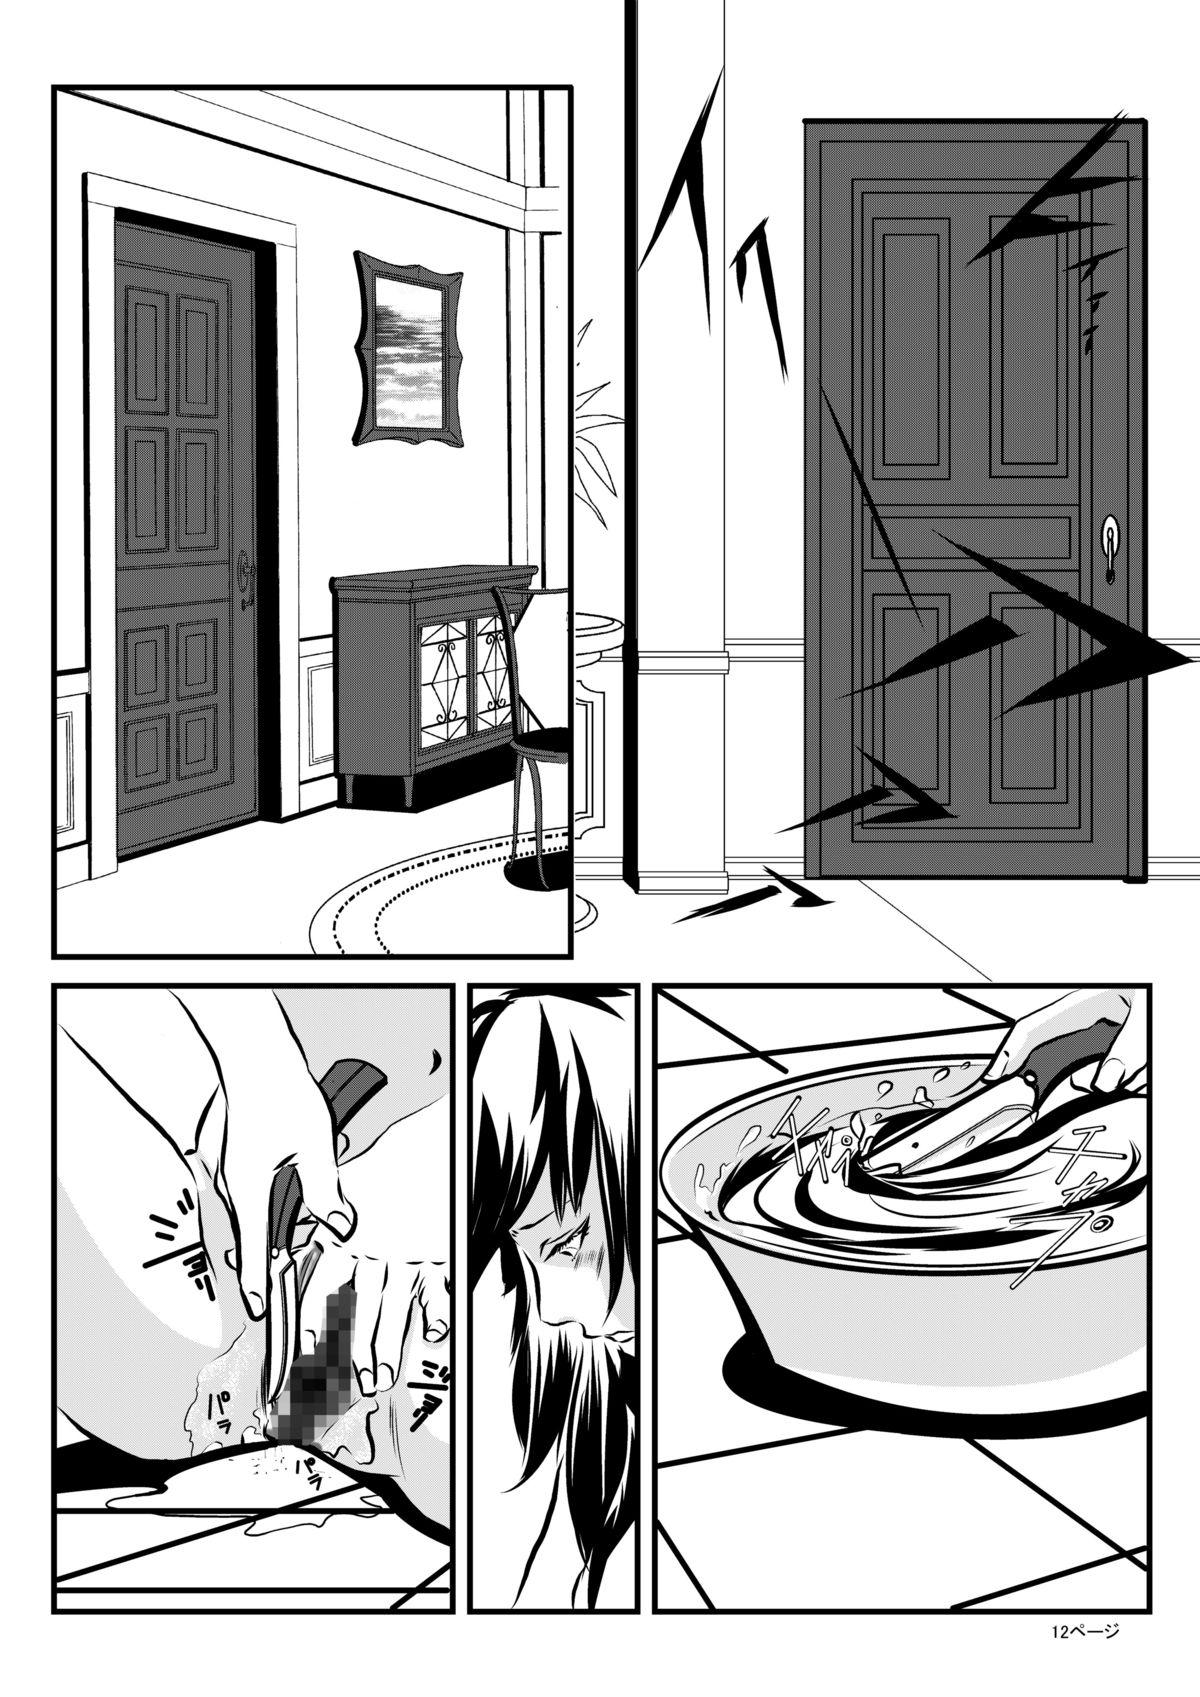 Loli Type no Jikkensitsu 10